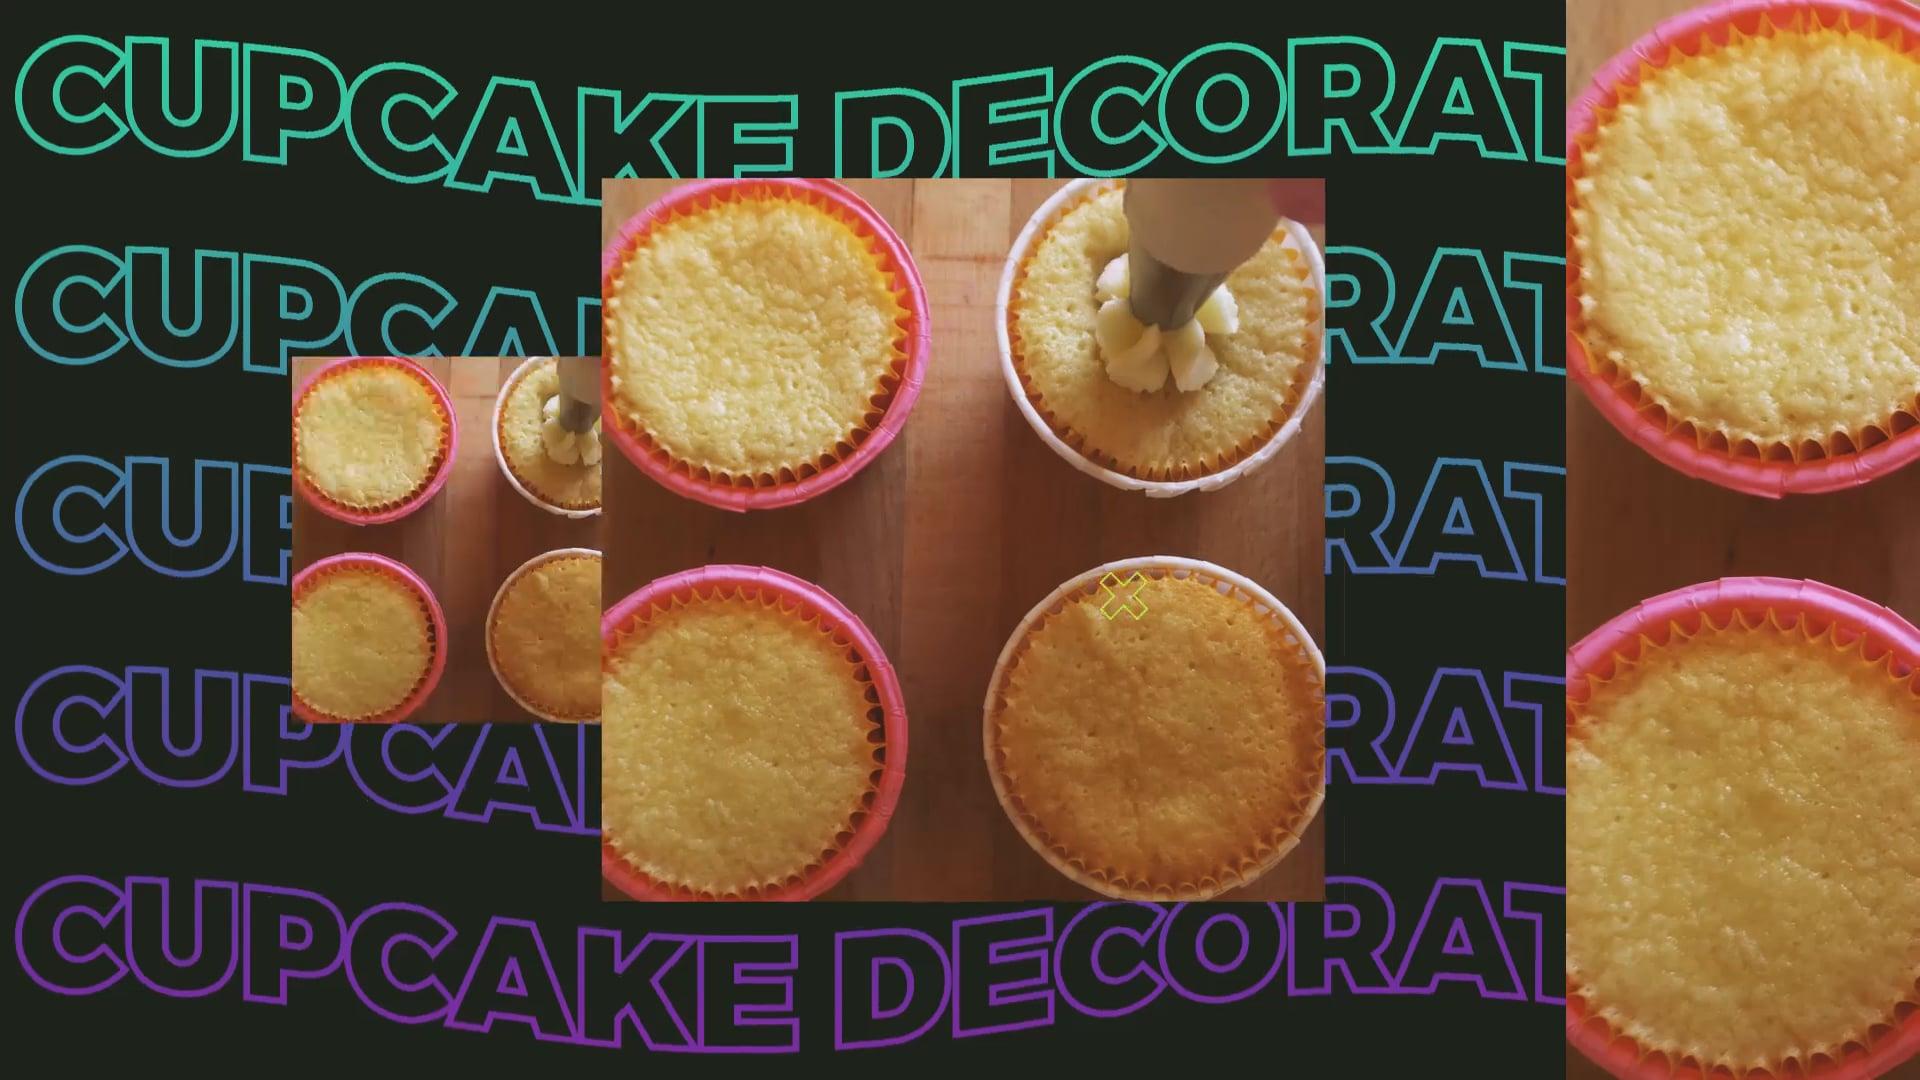 Virtual Cupcake Decorating